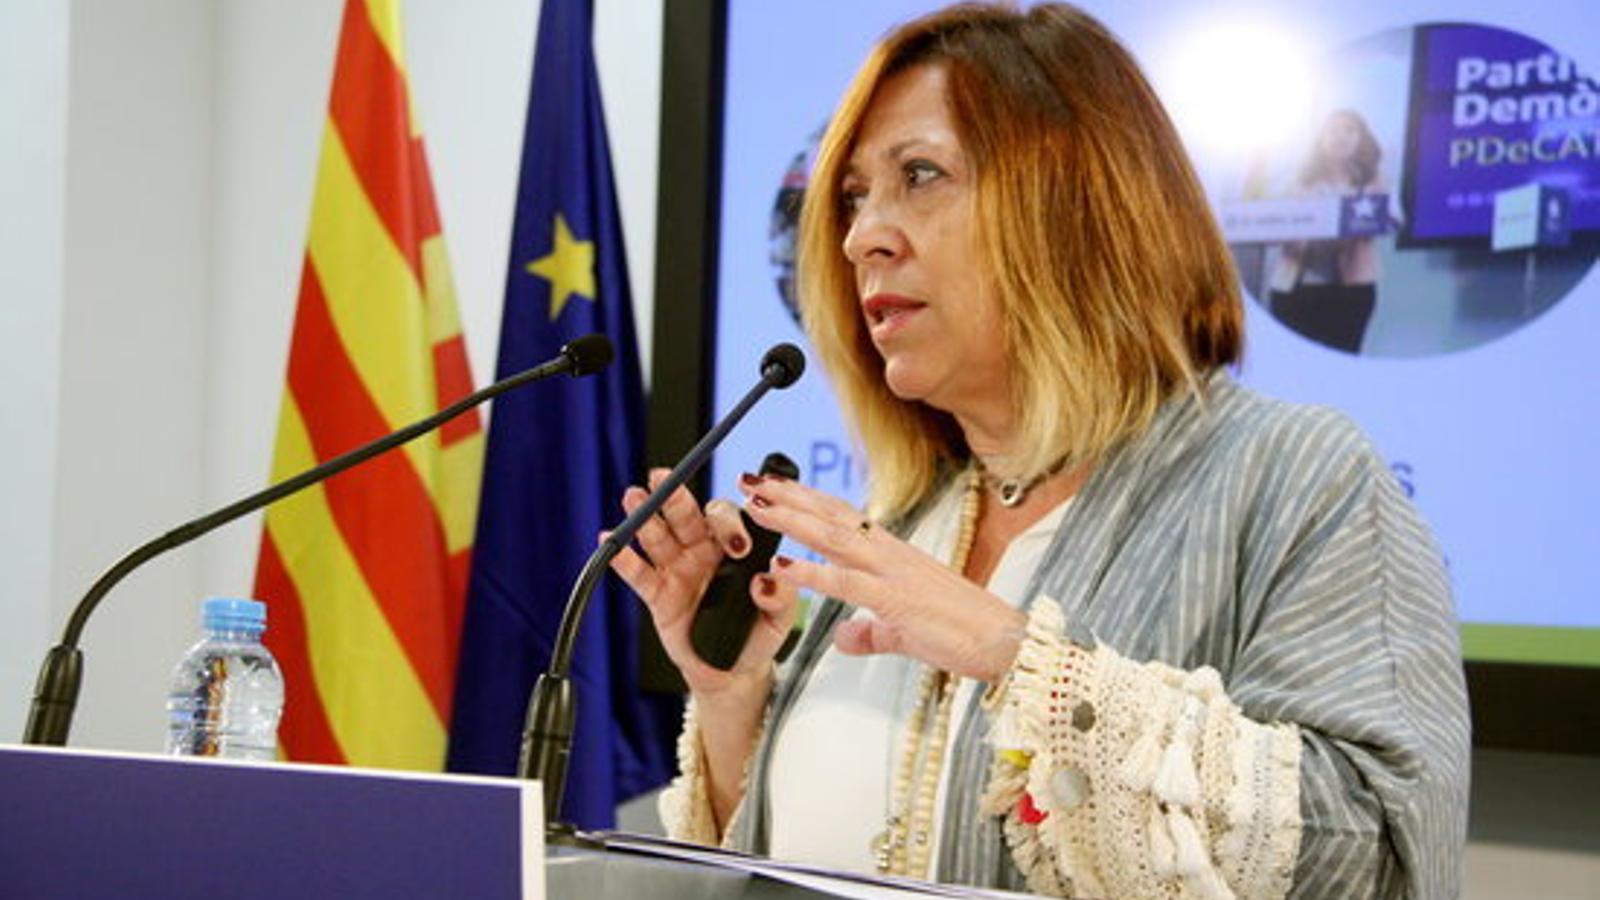 Actos de la Liga Regionalista Directora-referendum-PDECat-Montserrat-Candini_1801629972_41054782_651x366